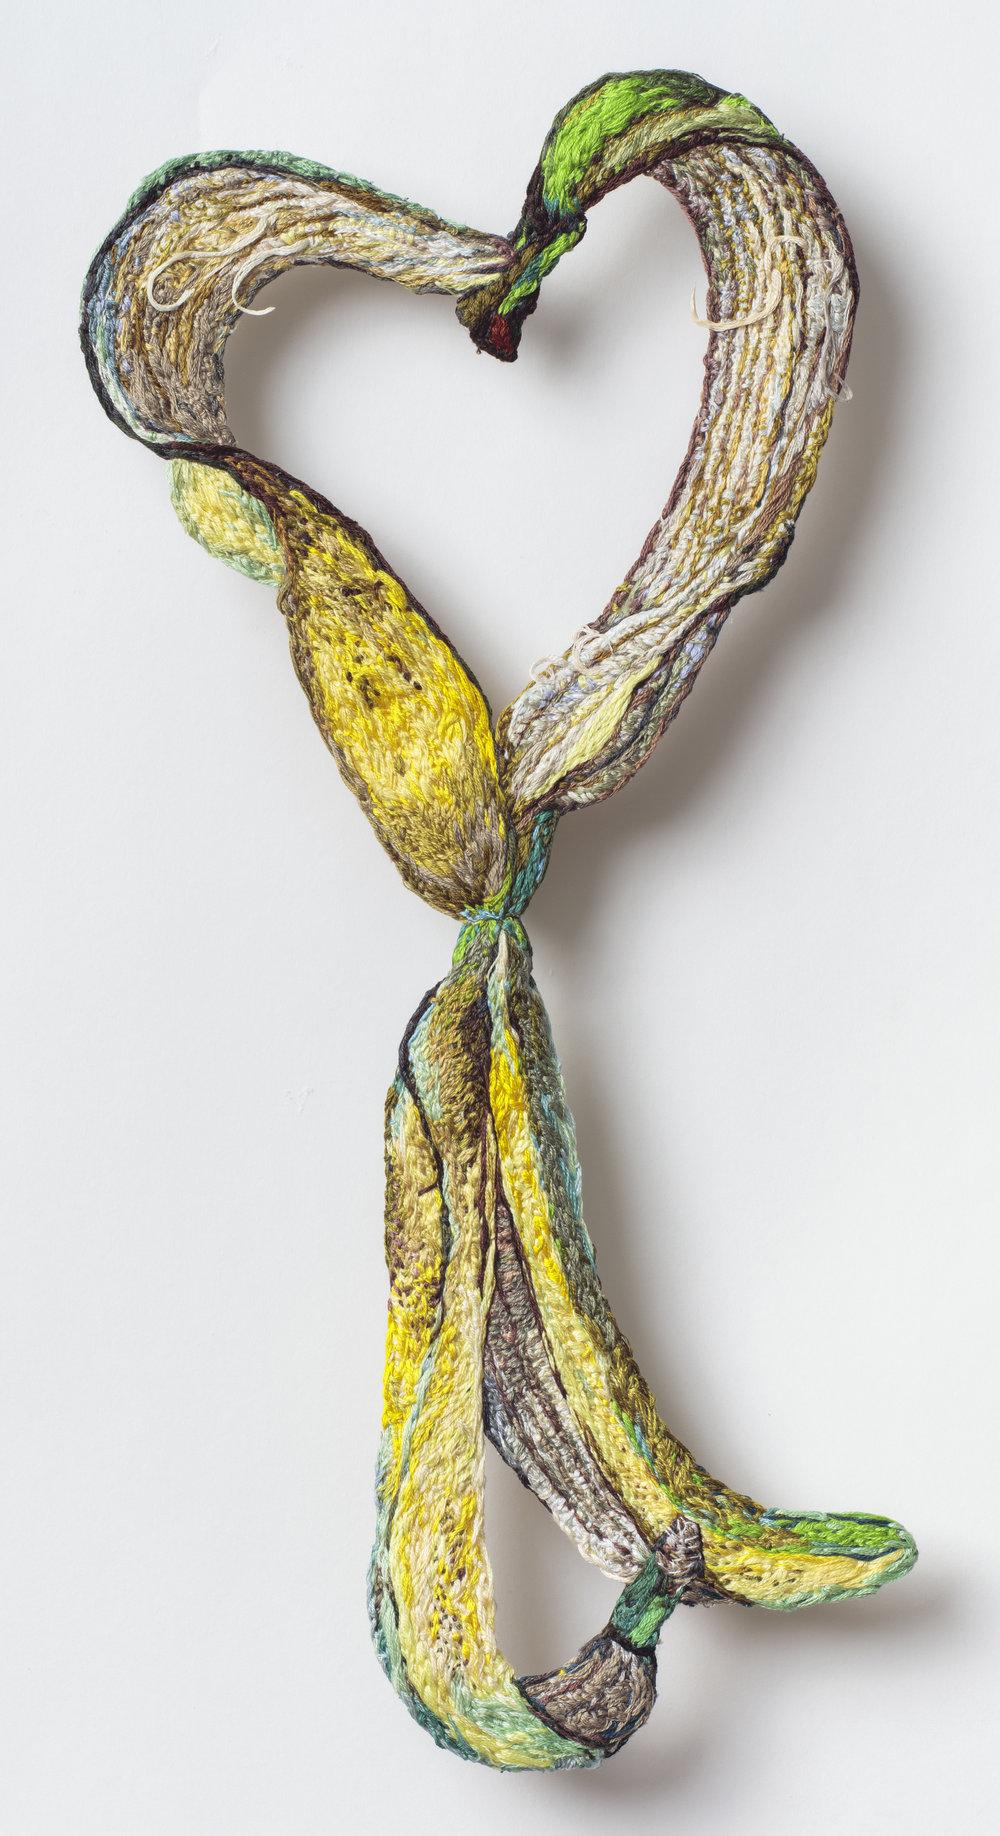 Peel, Sophia Narrett, 2019, Embroidery Thread, Aluminum, Fabric, 7 x 15 inches.jpg